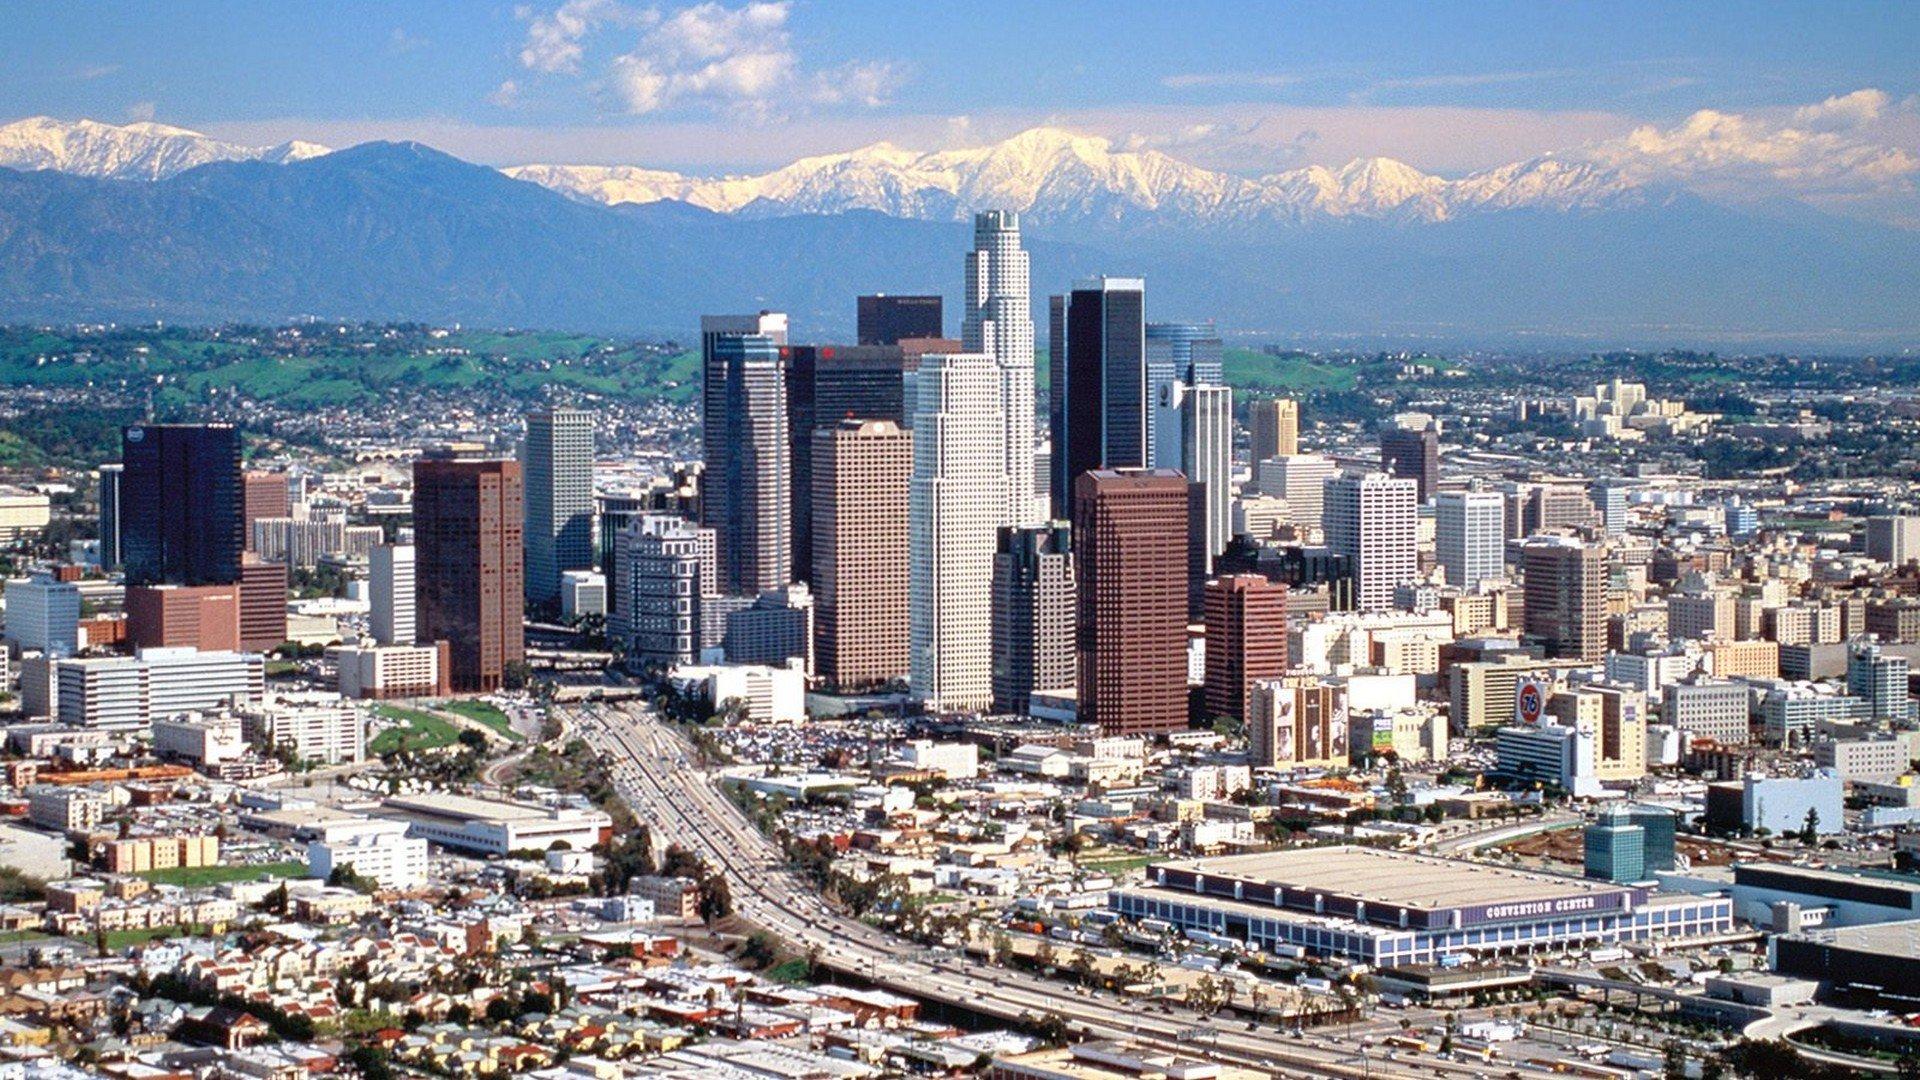 41 Los Angeles Hd Wallpapers 1080p On Wallpapersafari